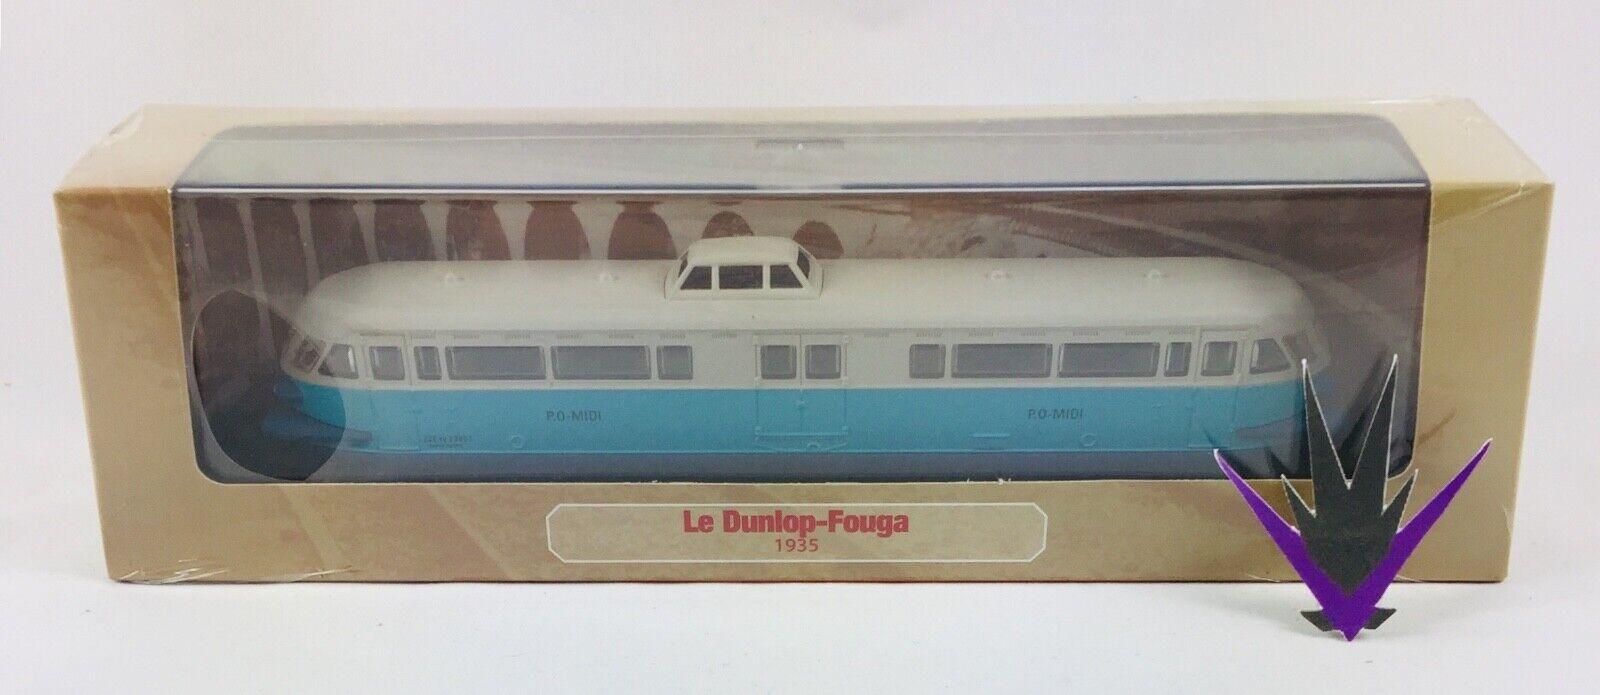 Atlas autorail micheline & oh 1 87 railcar dunlop-Fouga